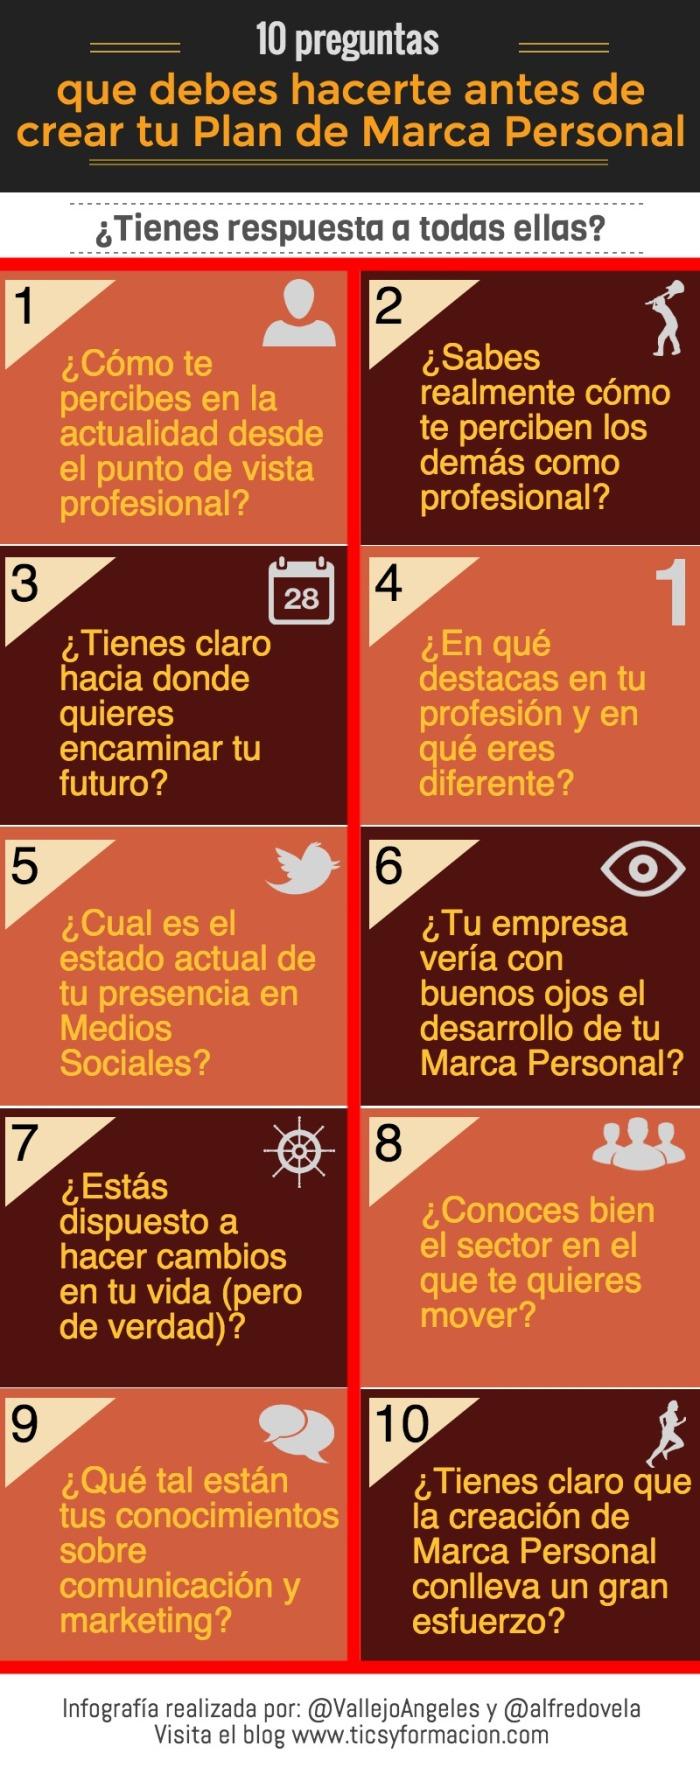 10-preguntas-claves-para-crear-marca-personal-infografia